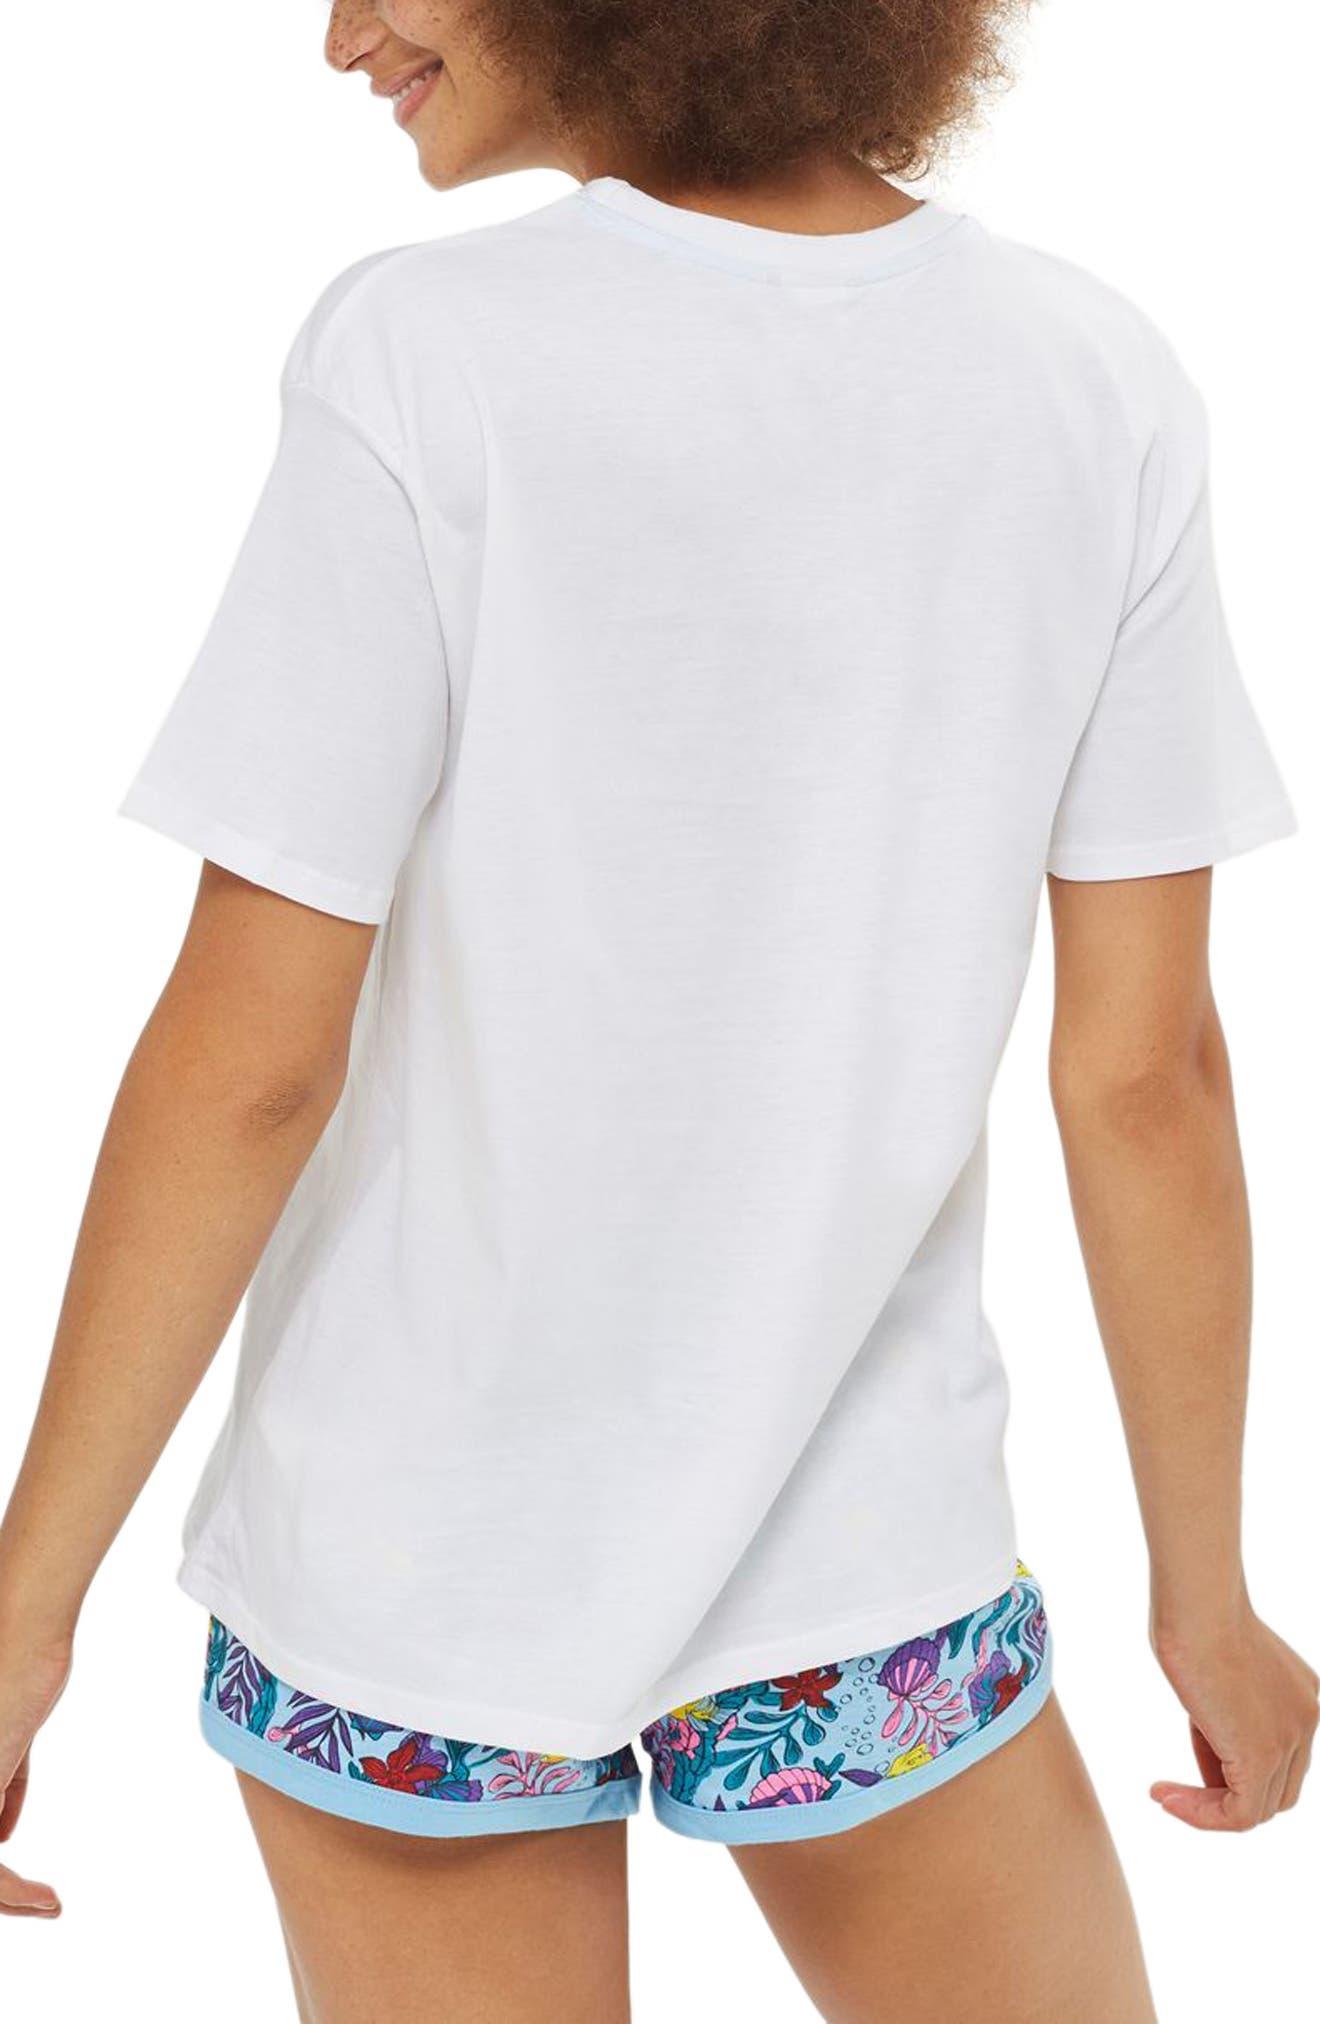 Shell Yeah Pajamas,                             Alternate thumbnail 2, color,                             White Multi